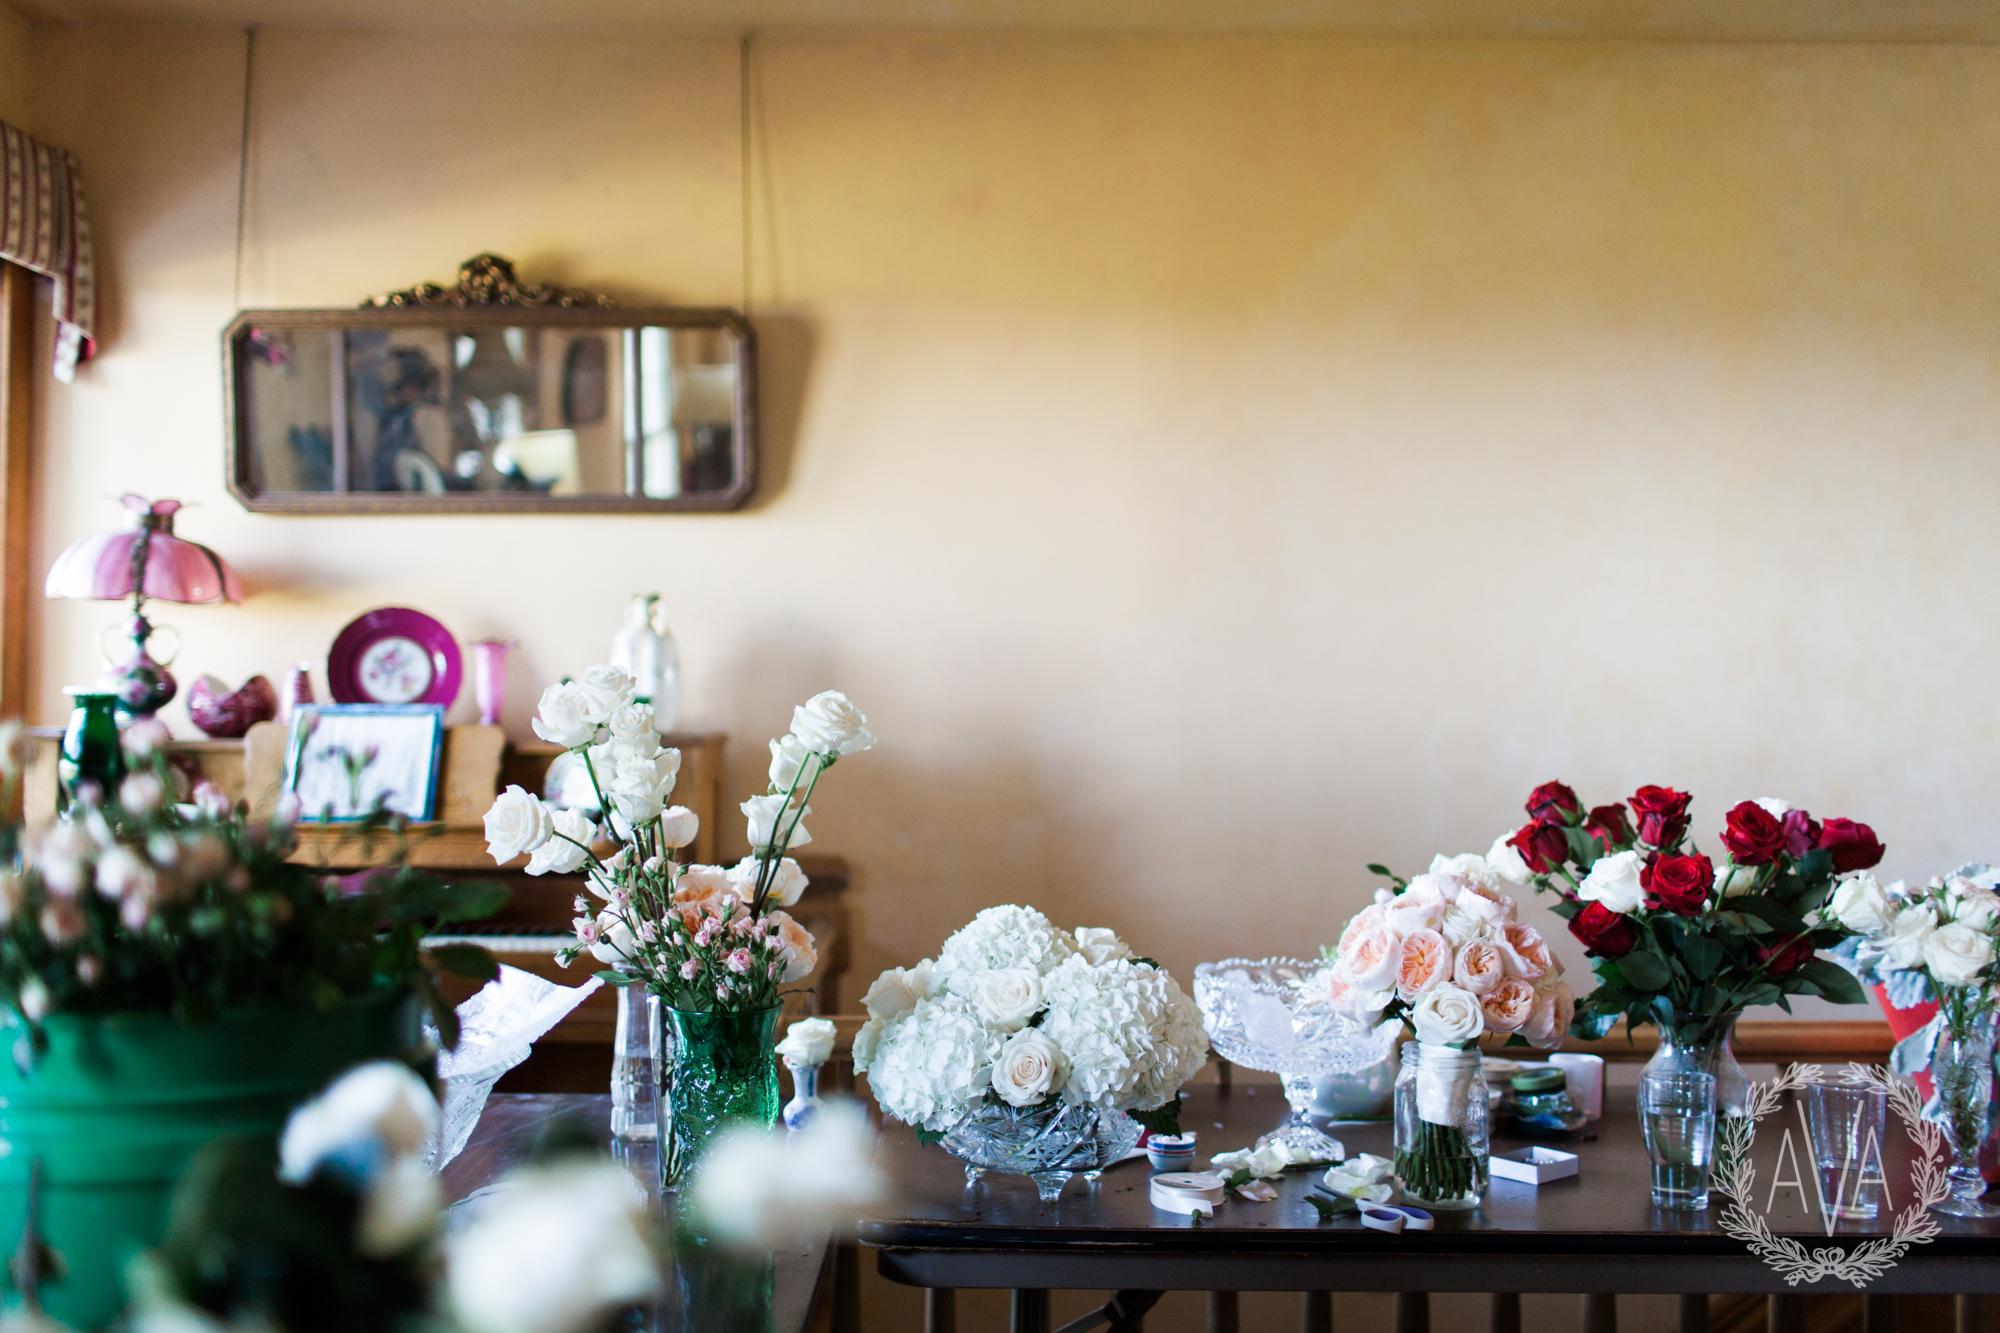 ava_chiew_wedding-1.jpg